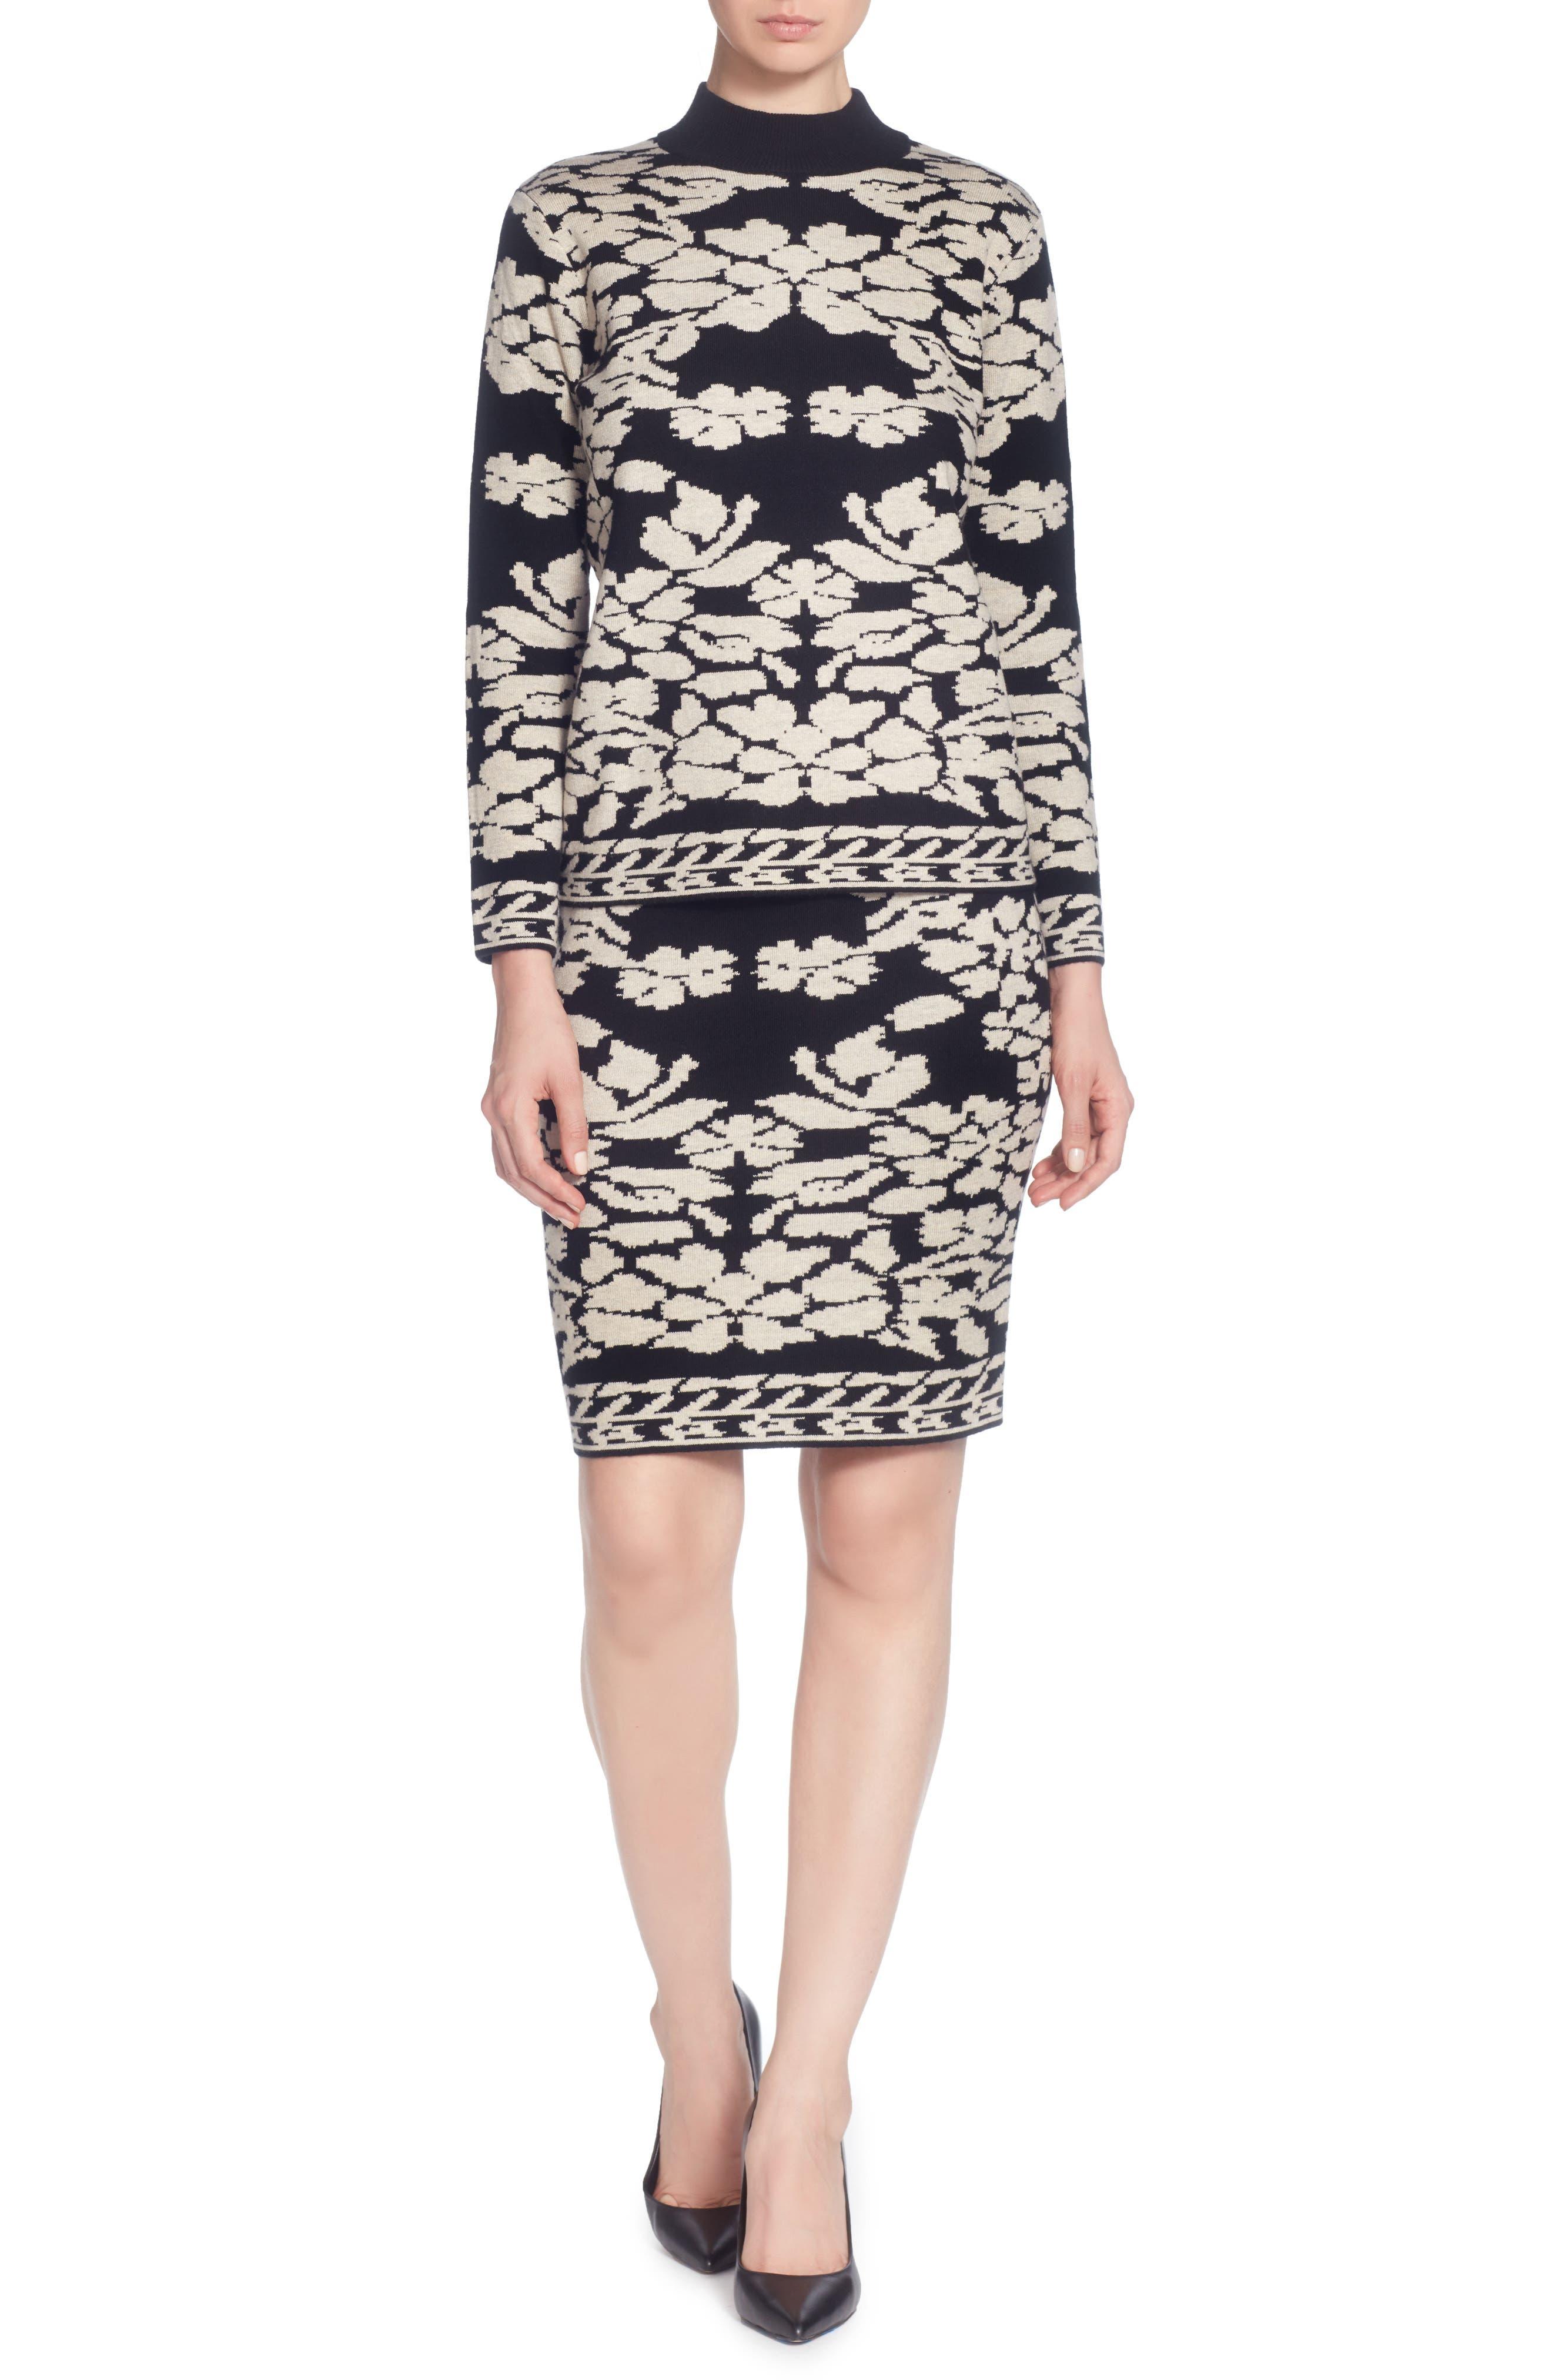 Uffie Floral Knit Skirt,                         Main,                         color, Black/ Neutral